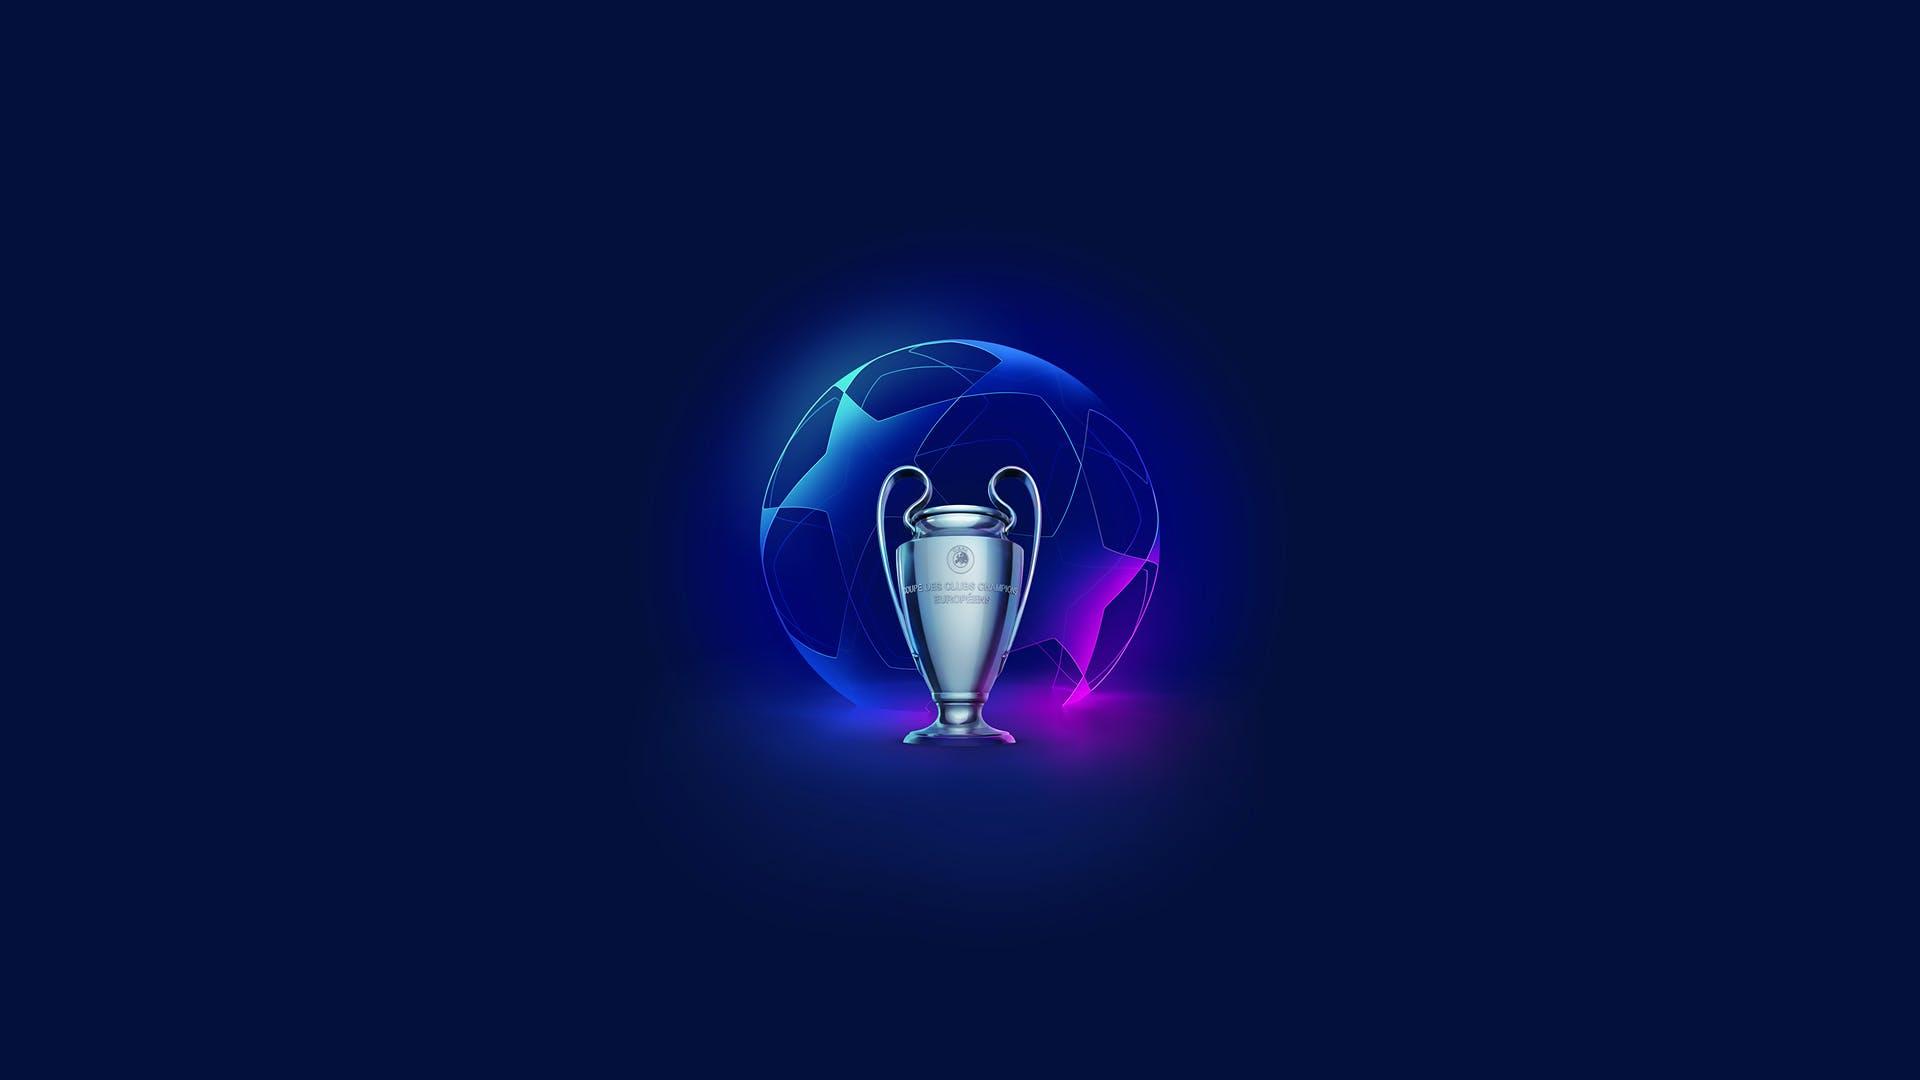 La parte creativa de la Champions League